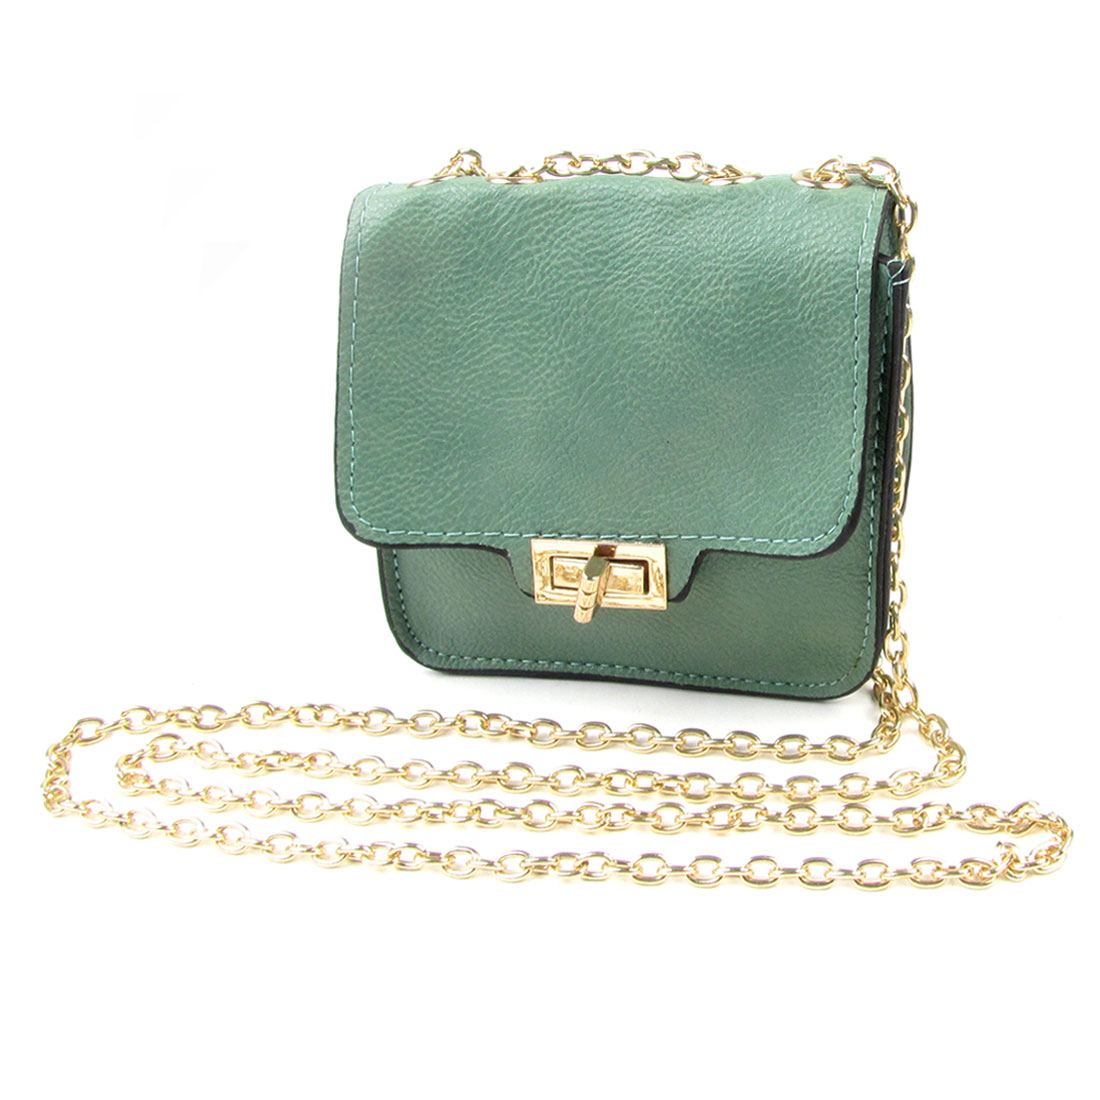 Litchi Print Faux Leather Gold Tone Chain Mini Crossbody Bag Handbag Green